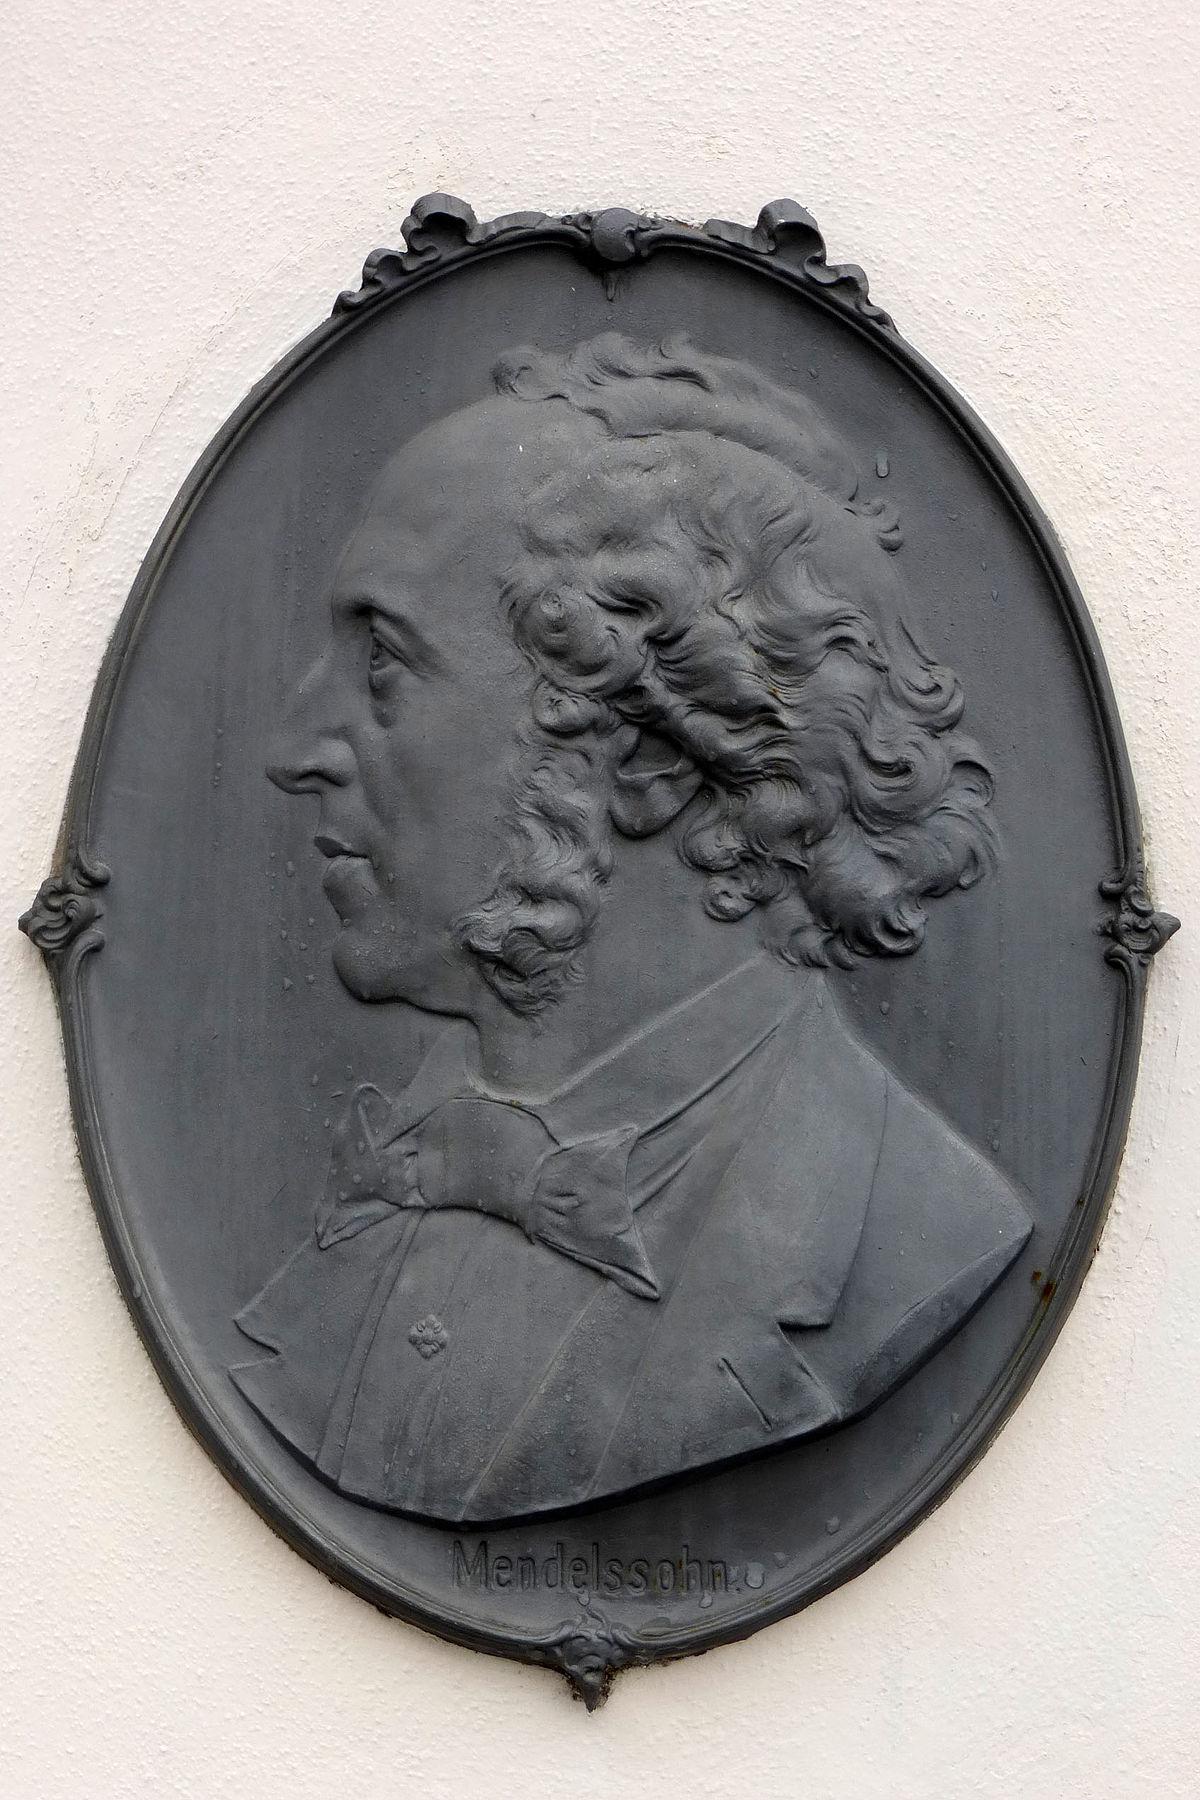 Mendelssohn Foundation